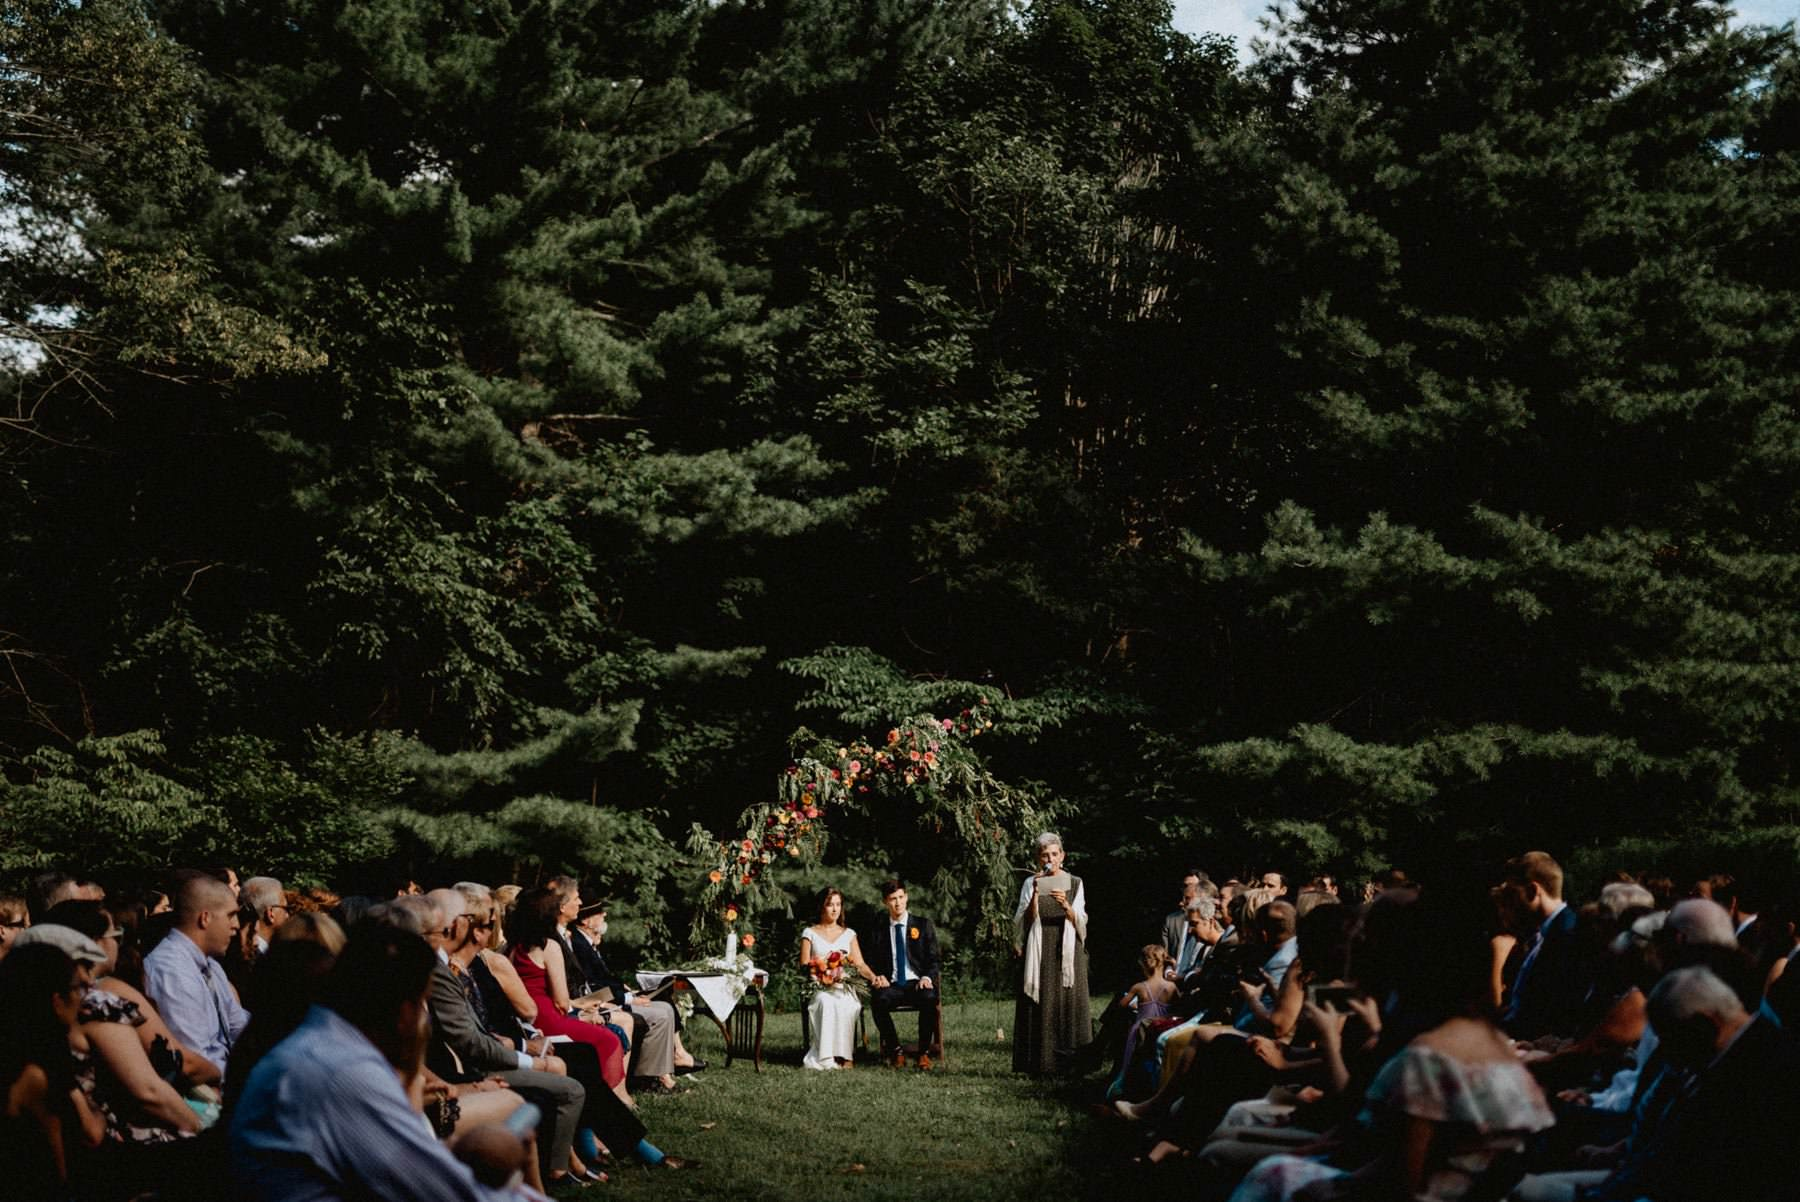 pennsylvania-private-estate-wedding-67.jpg